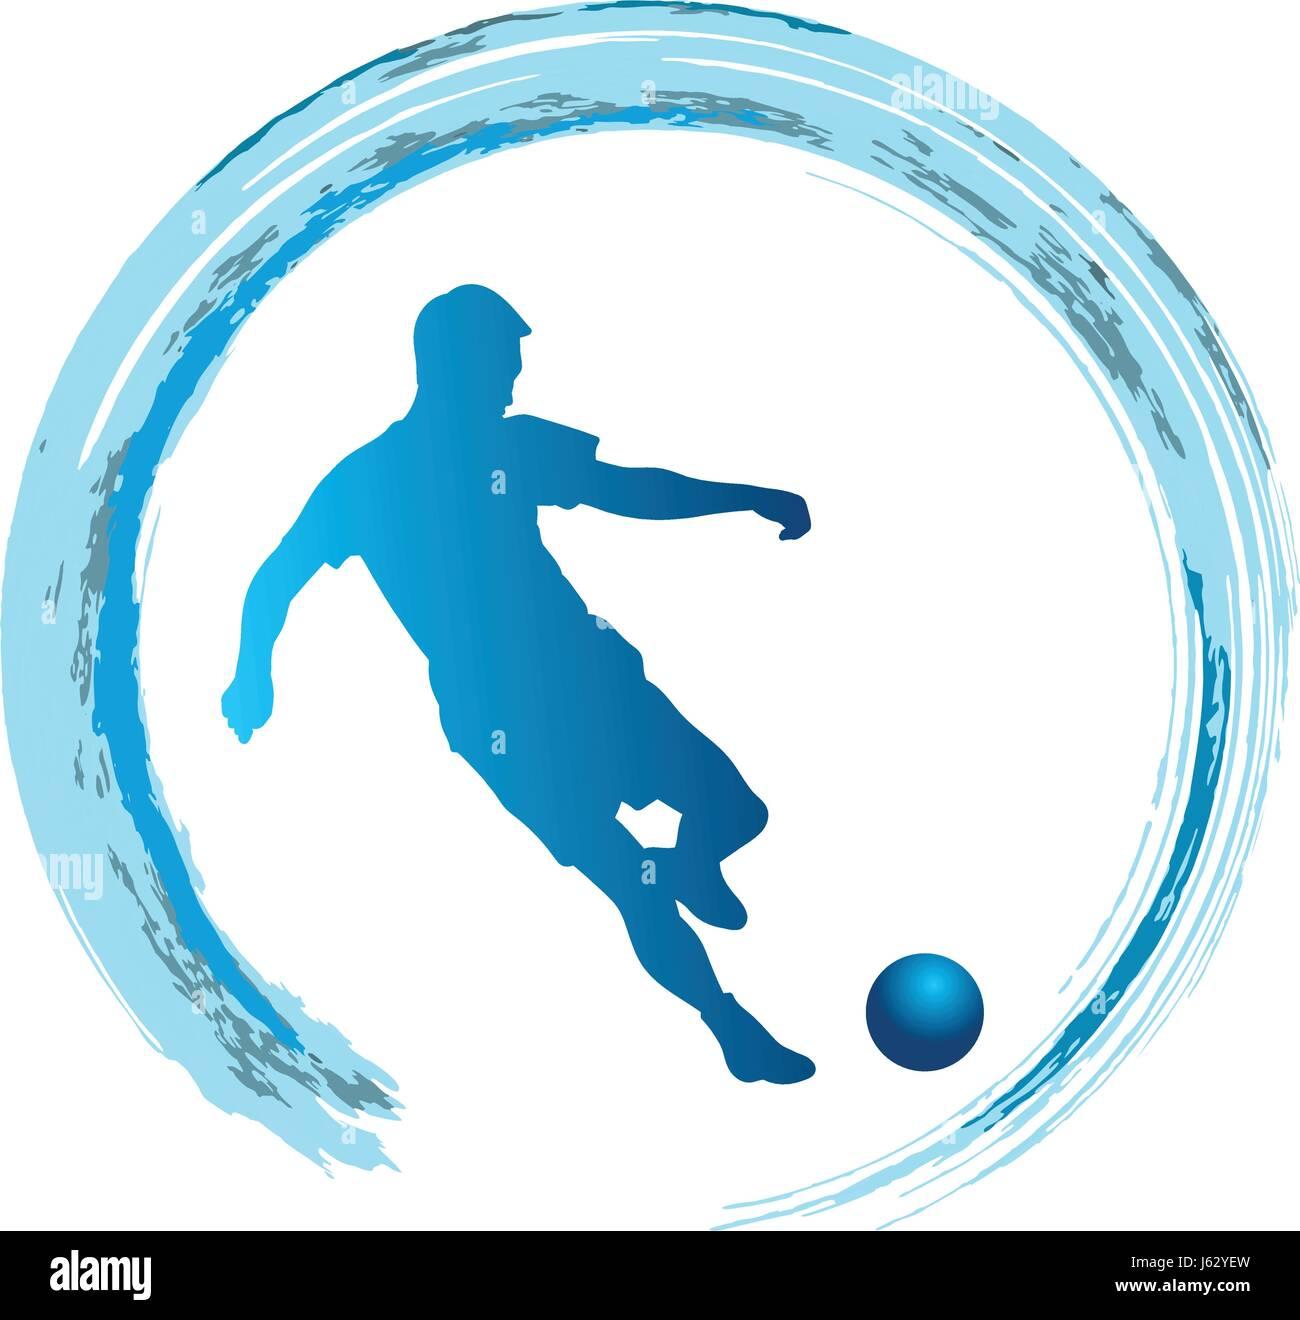 Silhouette of soccer player striking the ball - vector illustration - Stock Vector